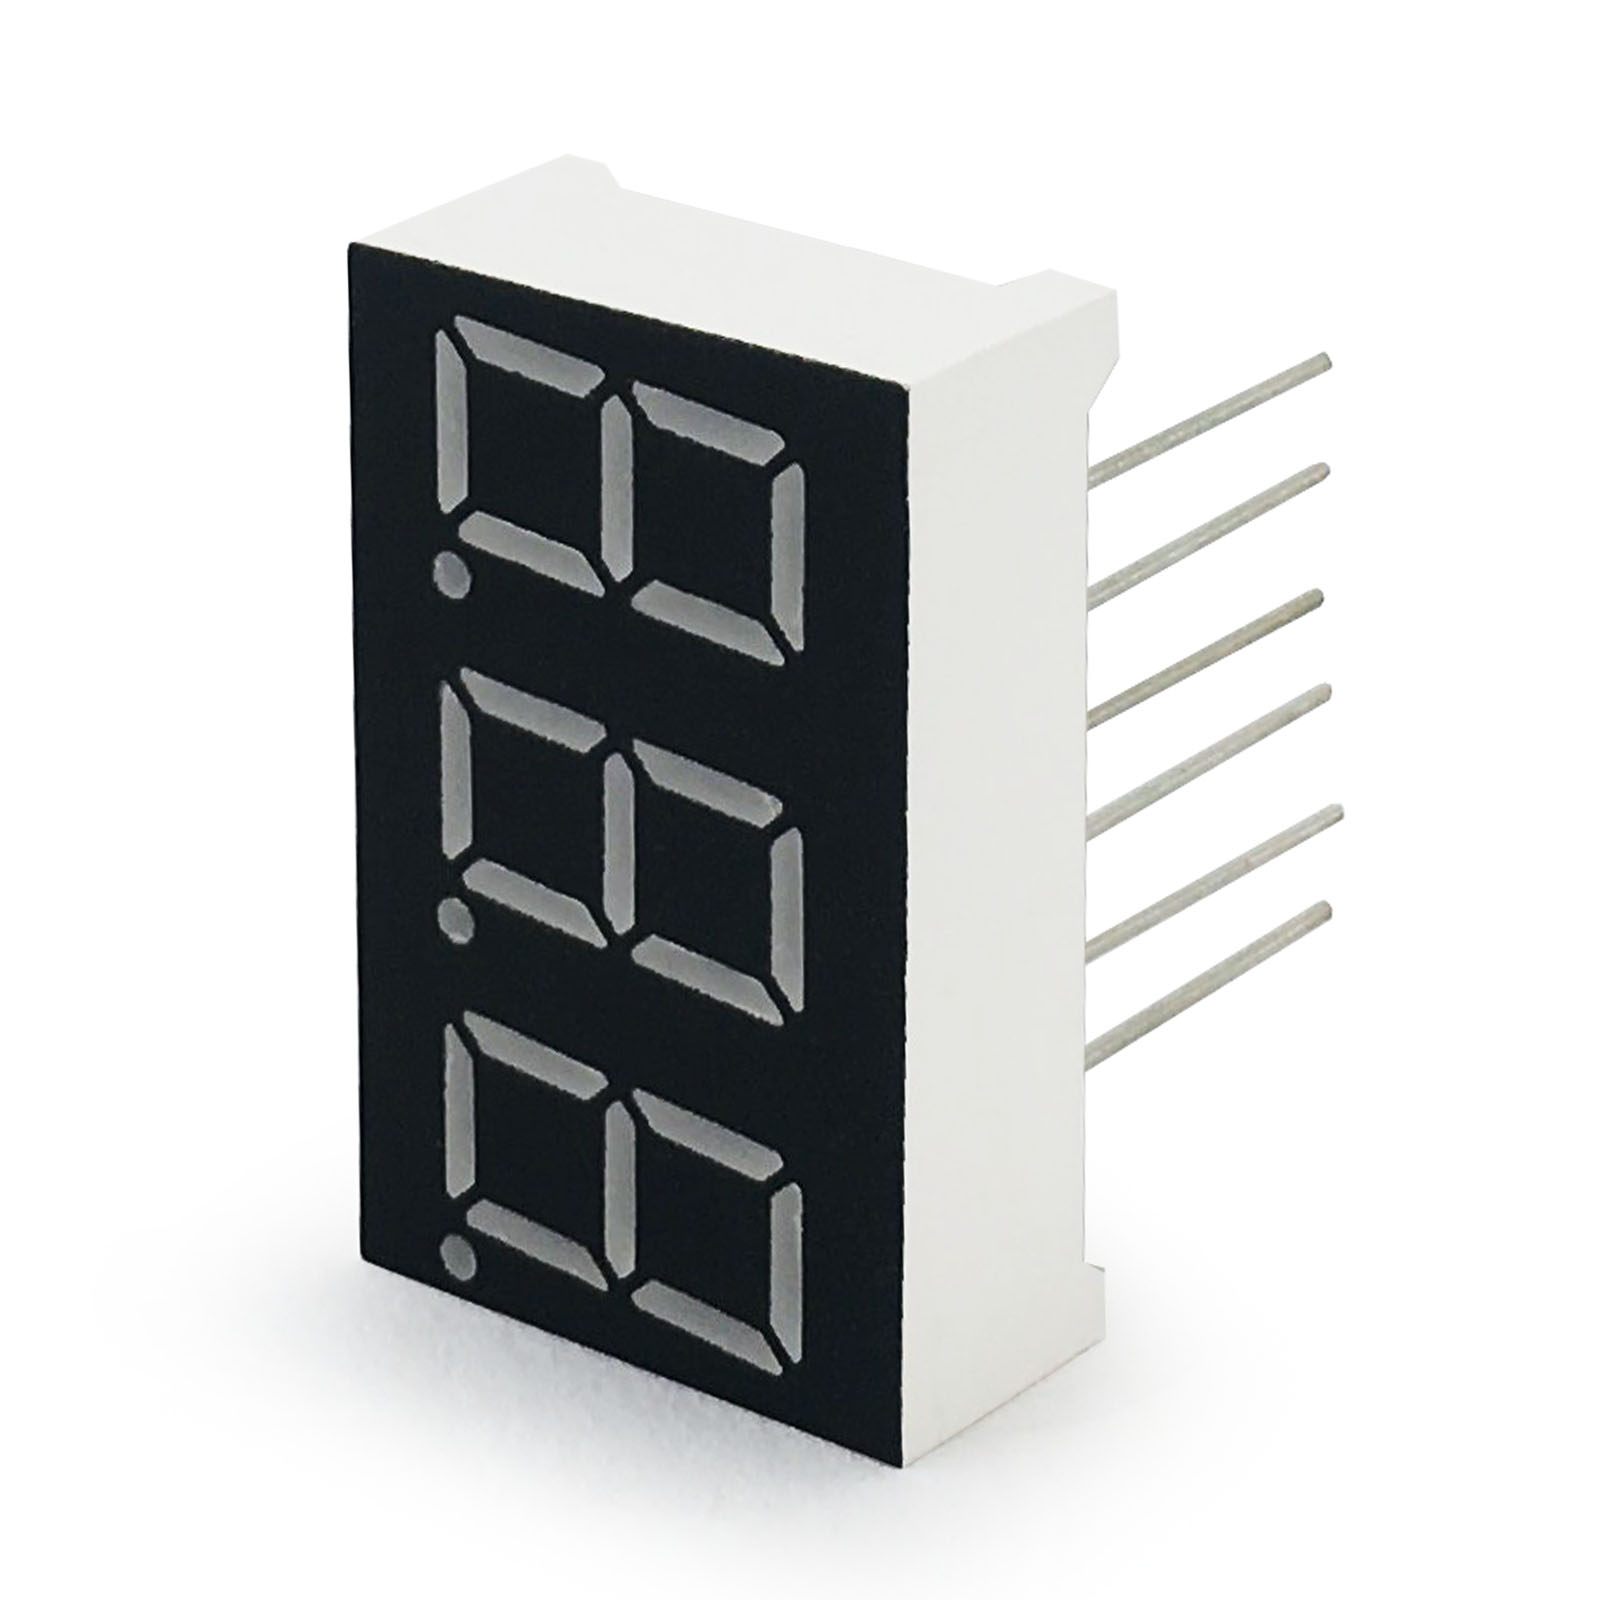 MCIGICM 10pcs 7 Segment Common Cathode 3 Bit Digital Tube 0.36